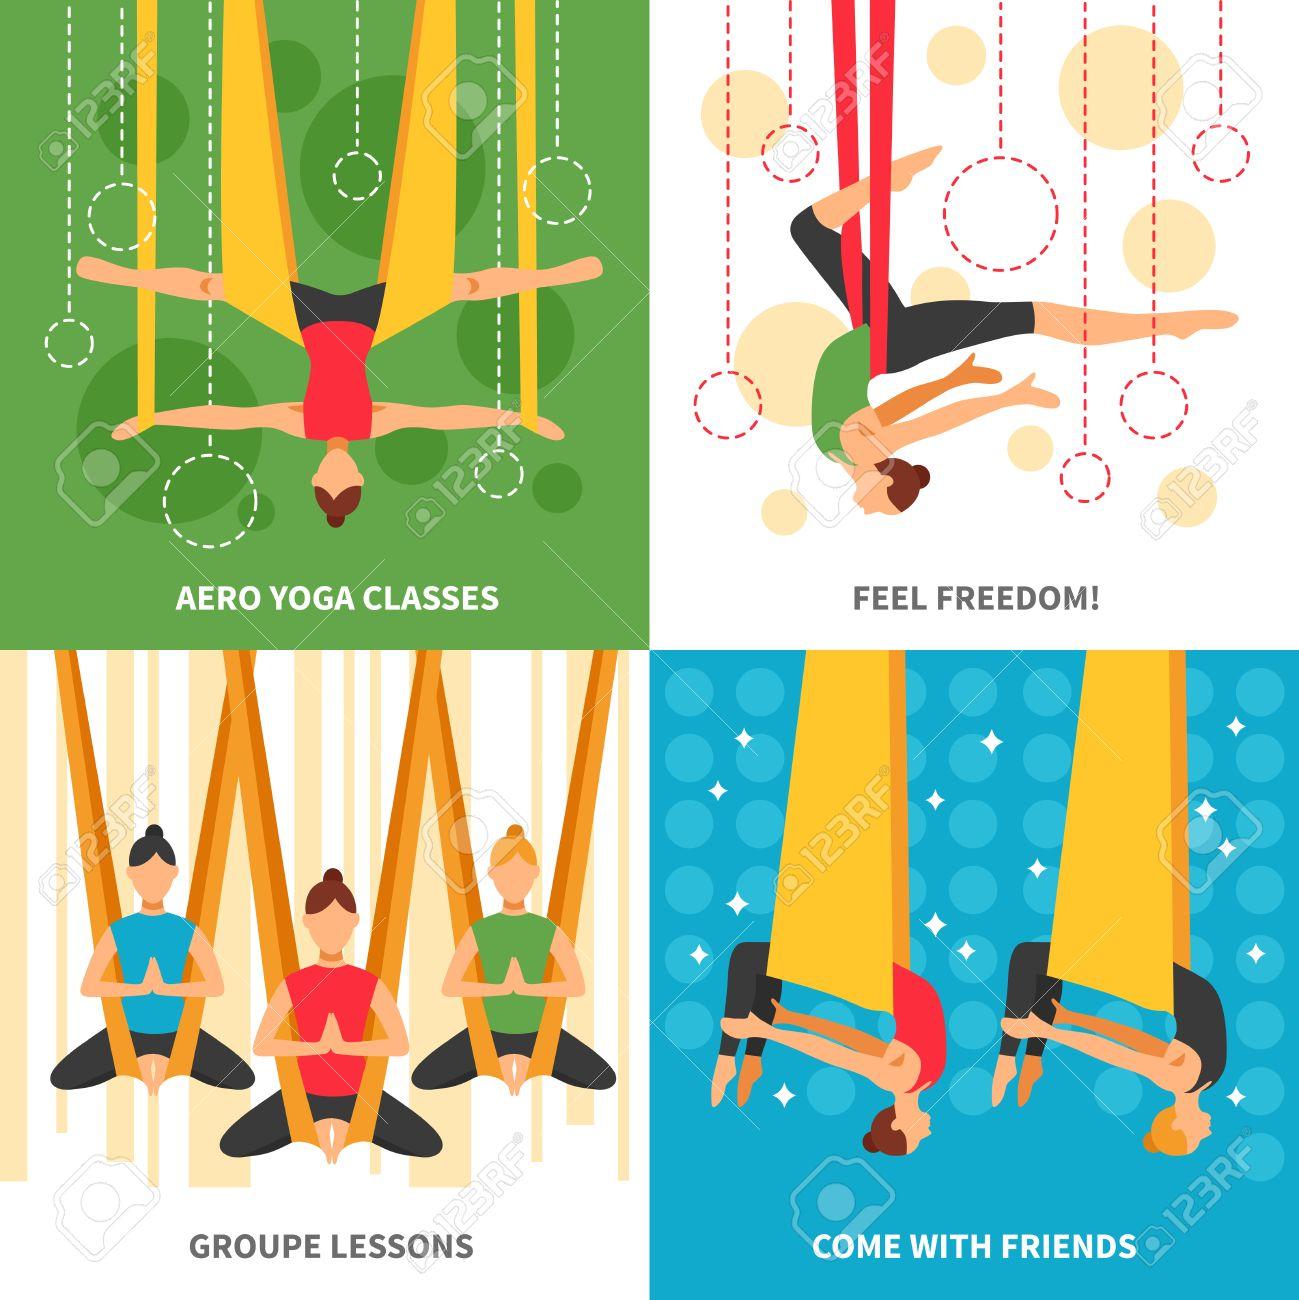 Aero Yoga Design Concept Four Square Icon Set With Themes Aero Royalty Free Cliparts Vectors And Stock Illustration Image 59152270